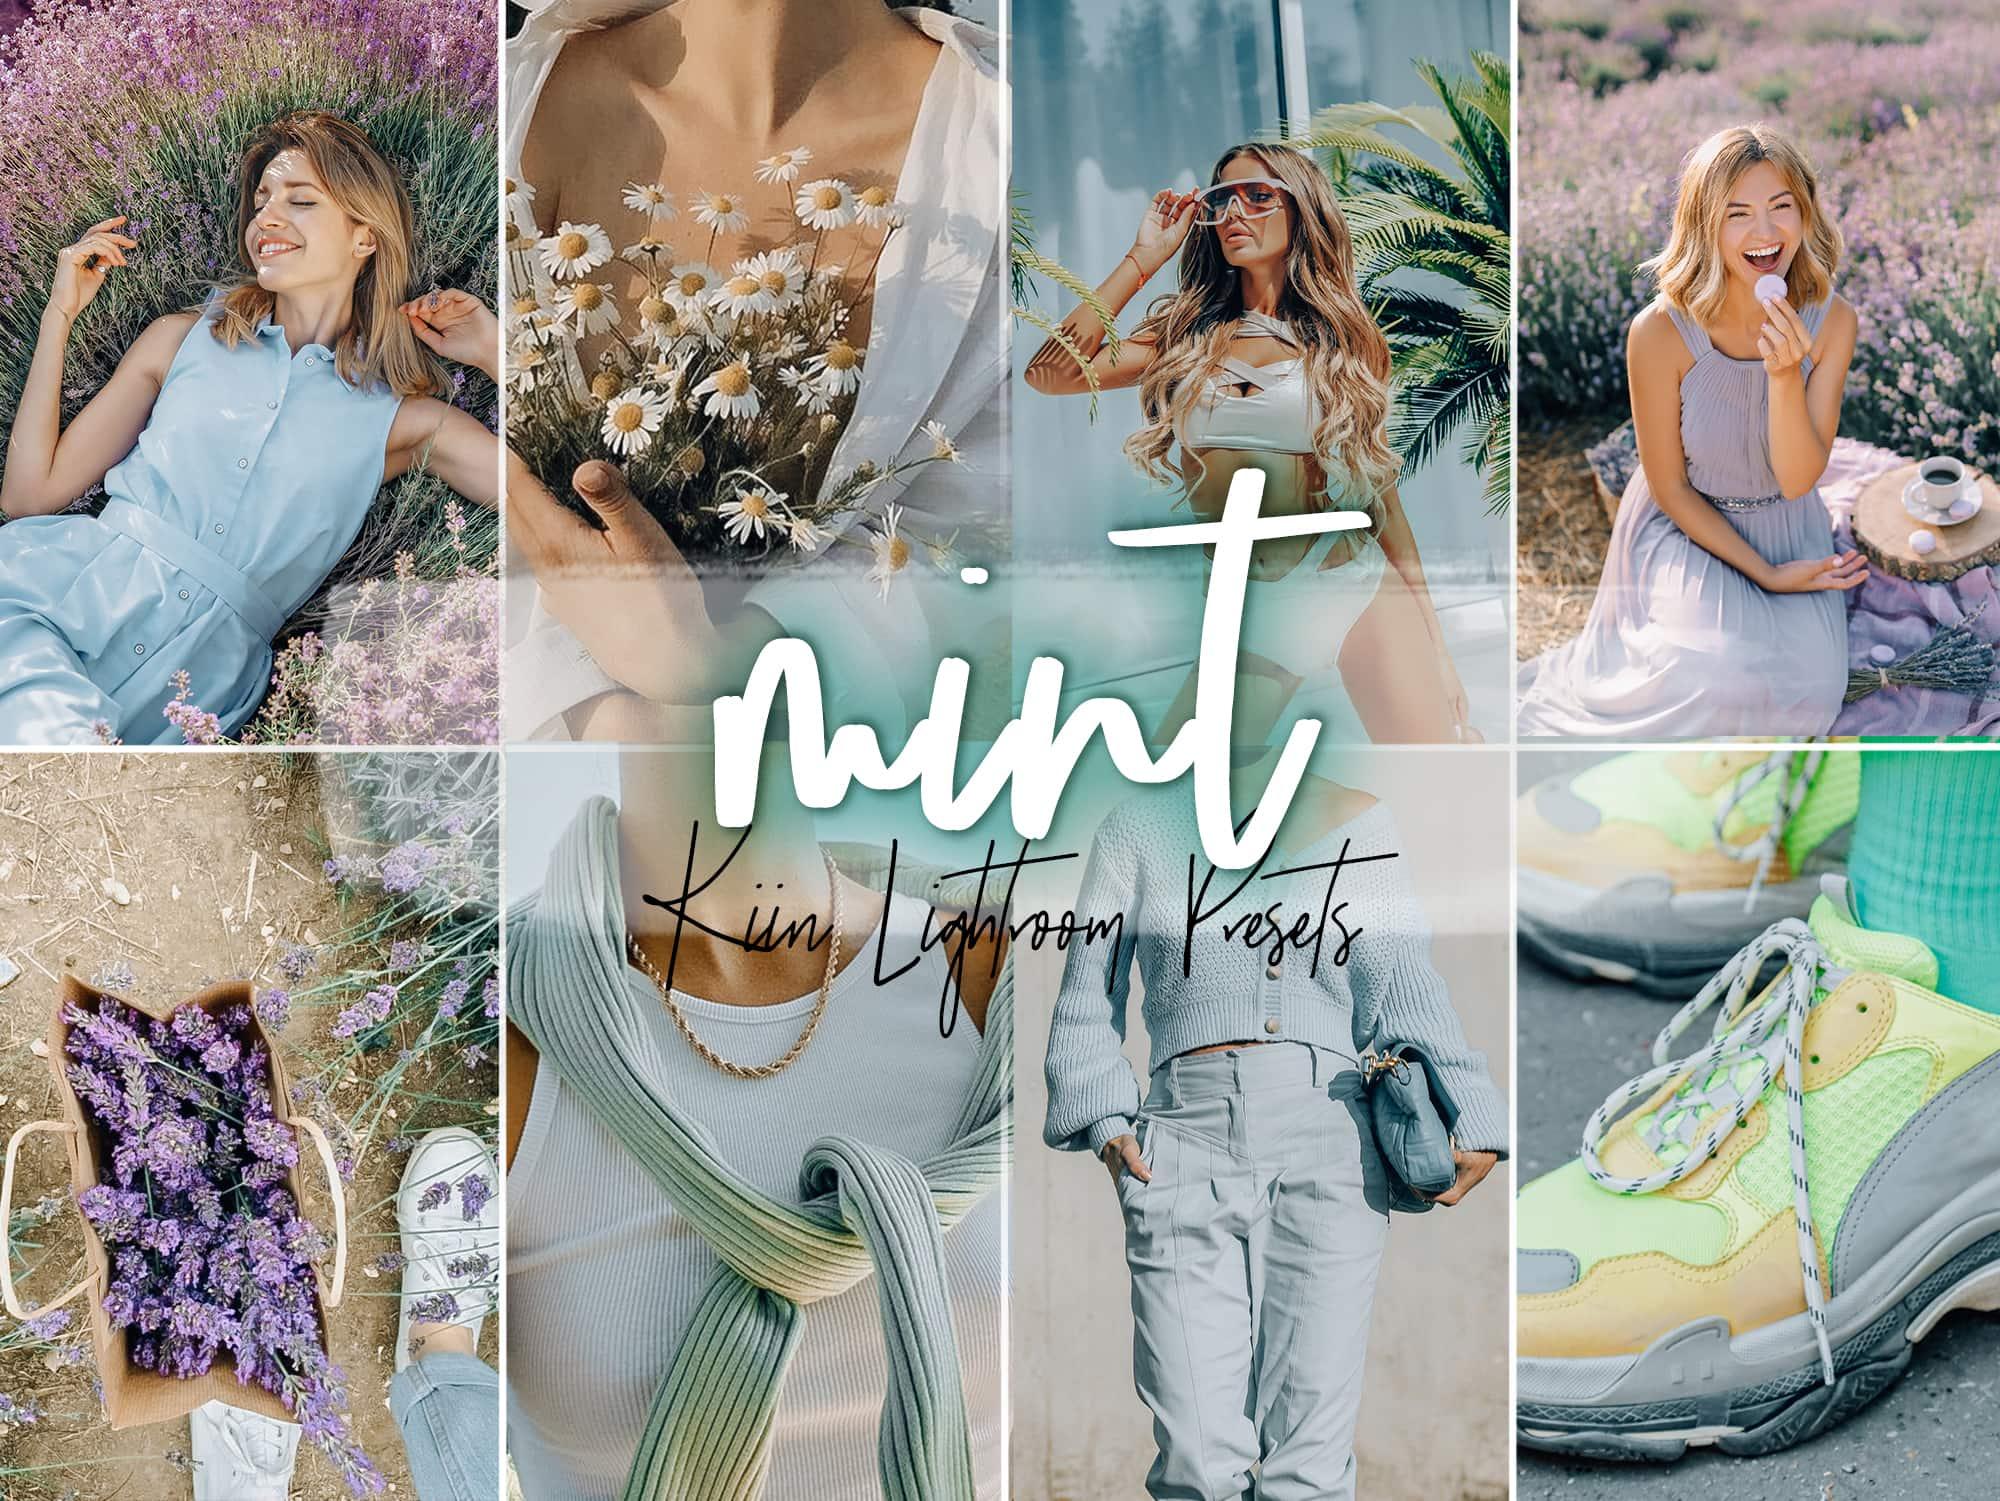 KIIN Lilac Mint Lightroom presets